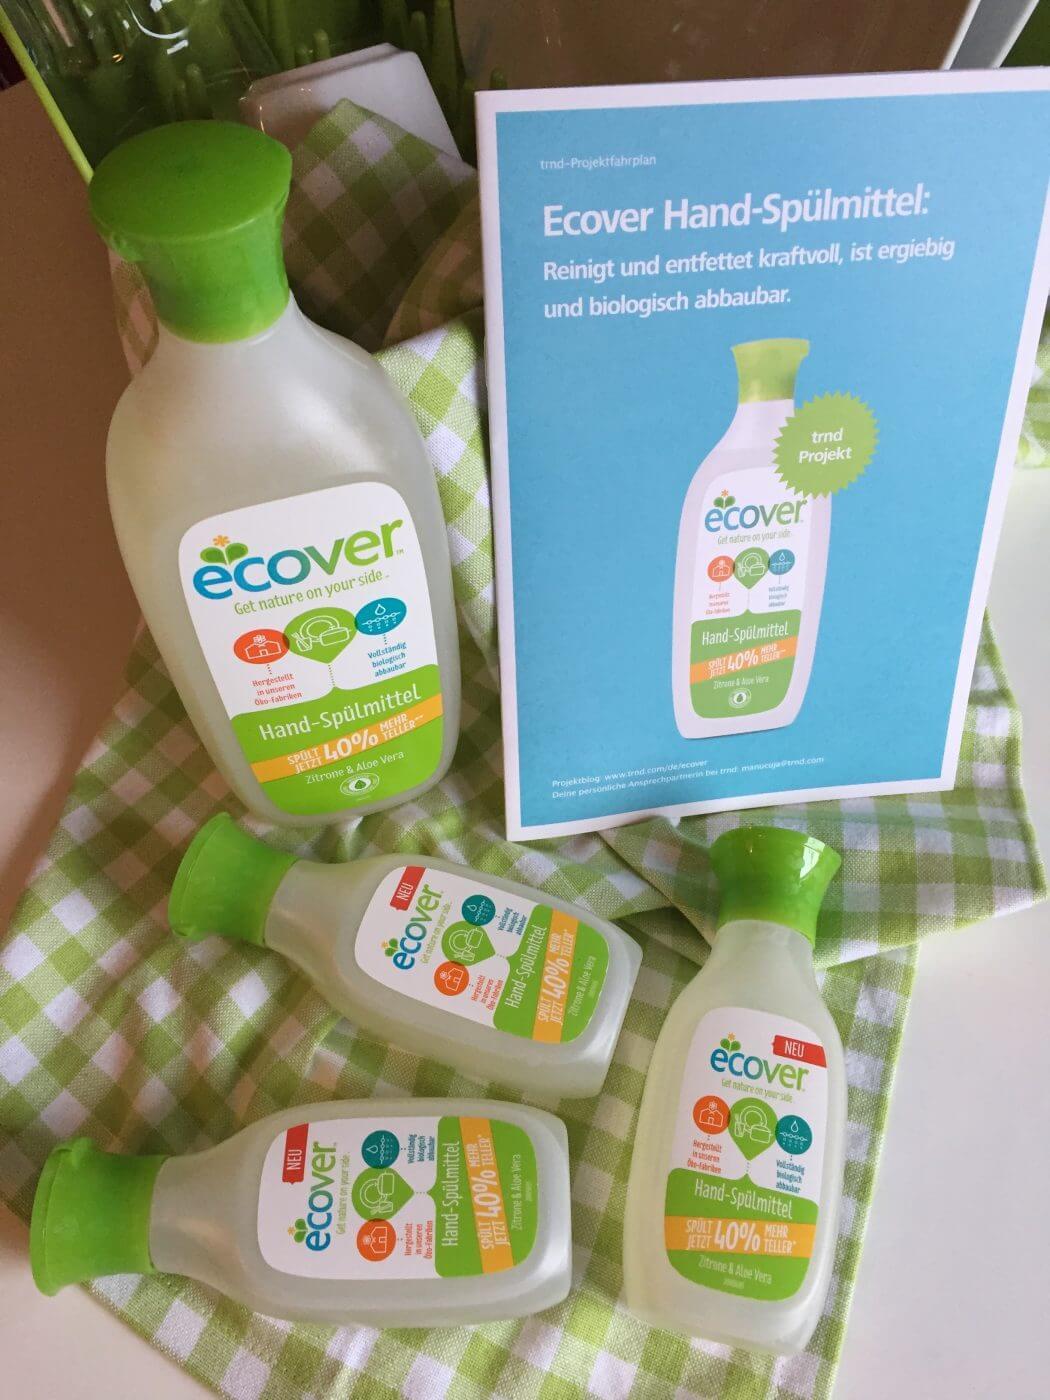 Ecover Hand-Spülmittel